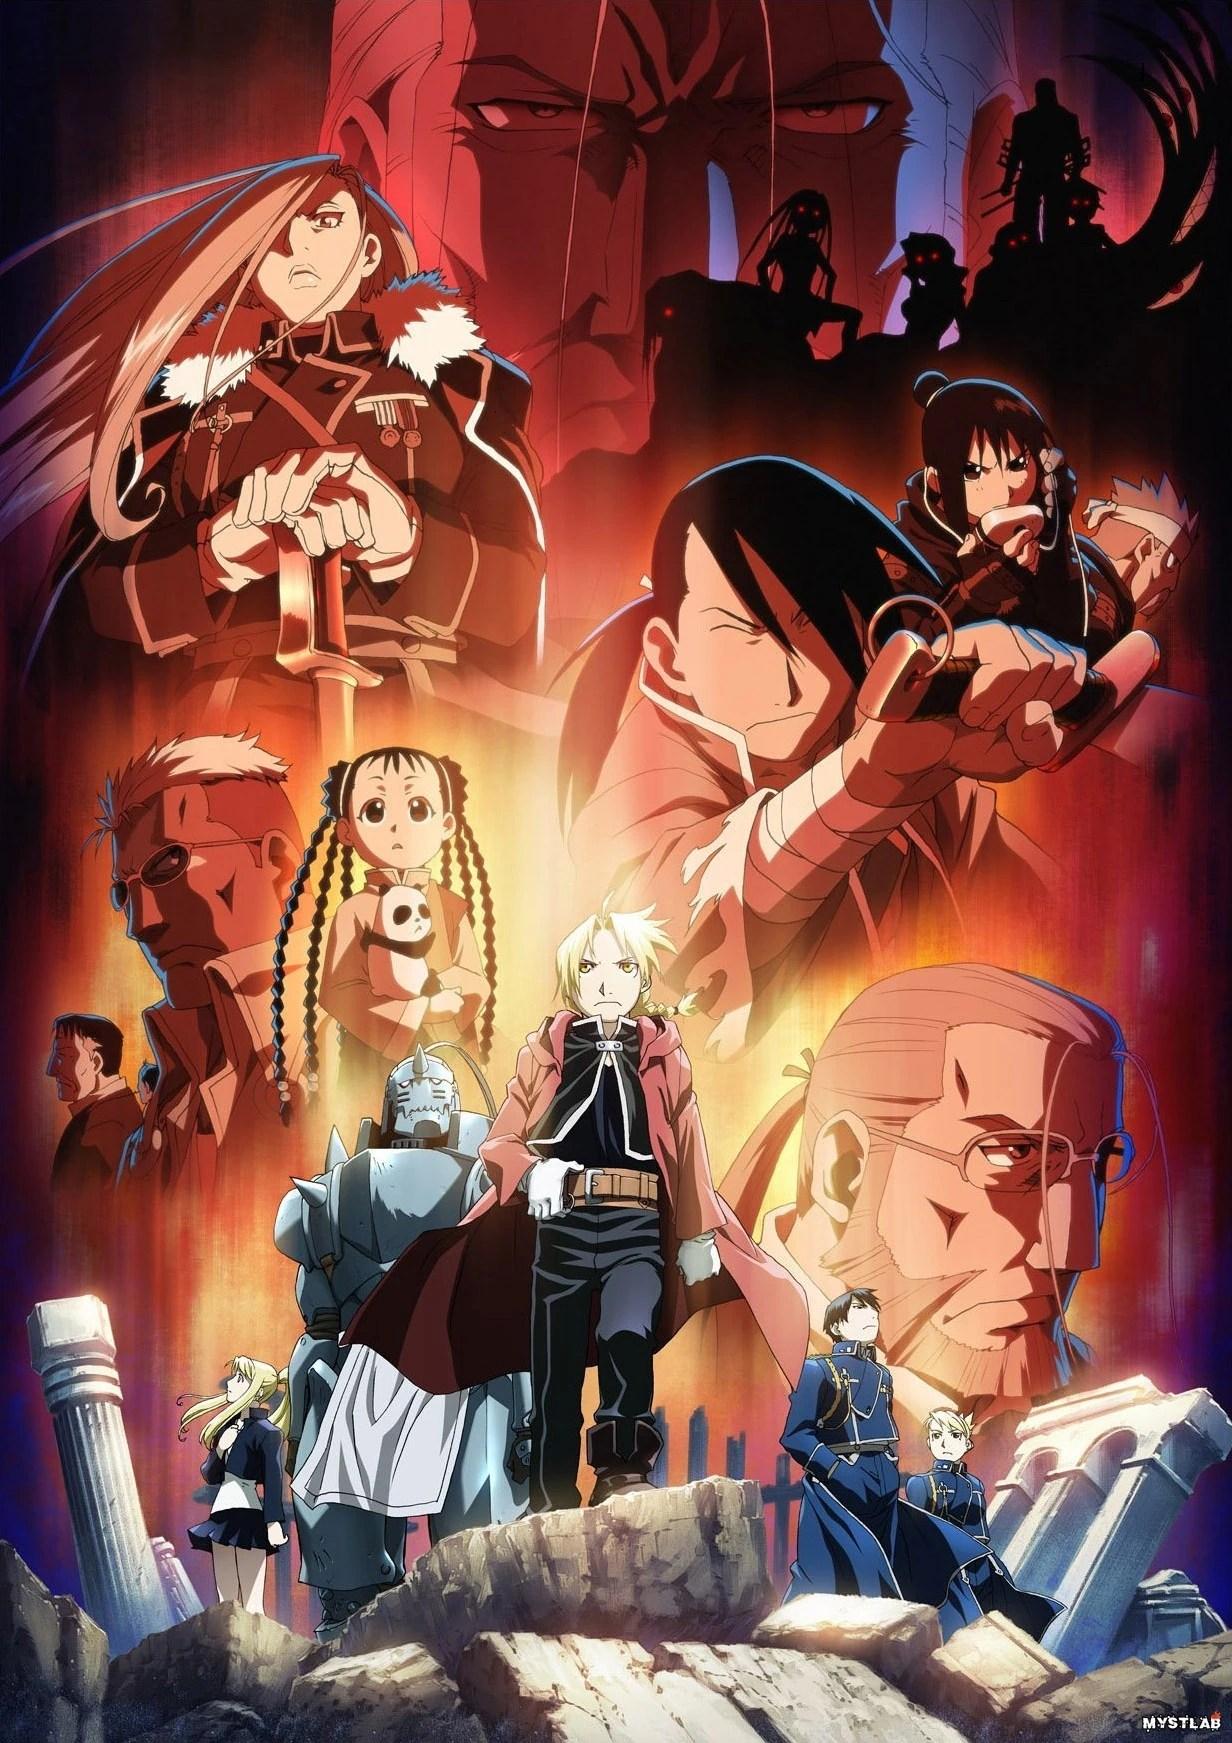 Fullmetal Alchemist (franchise)   Full Metal Alchemist   Fandom powered by Wikia